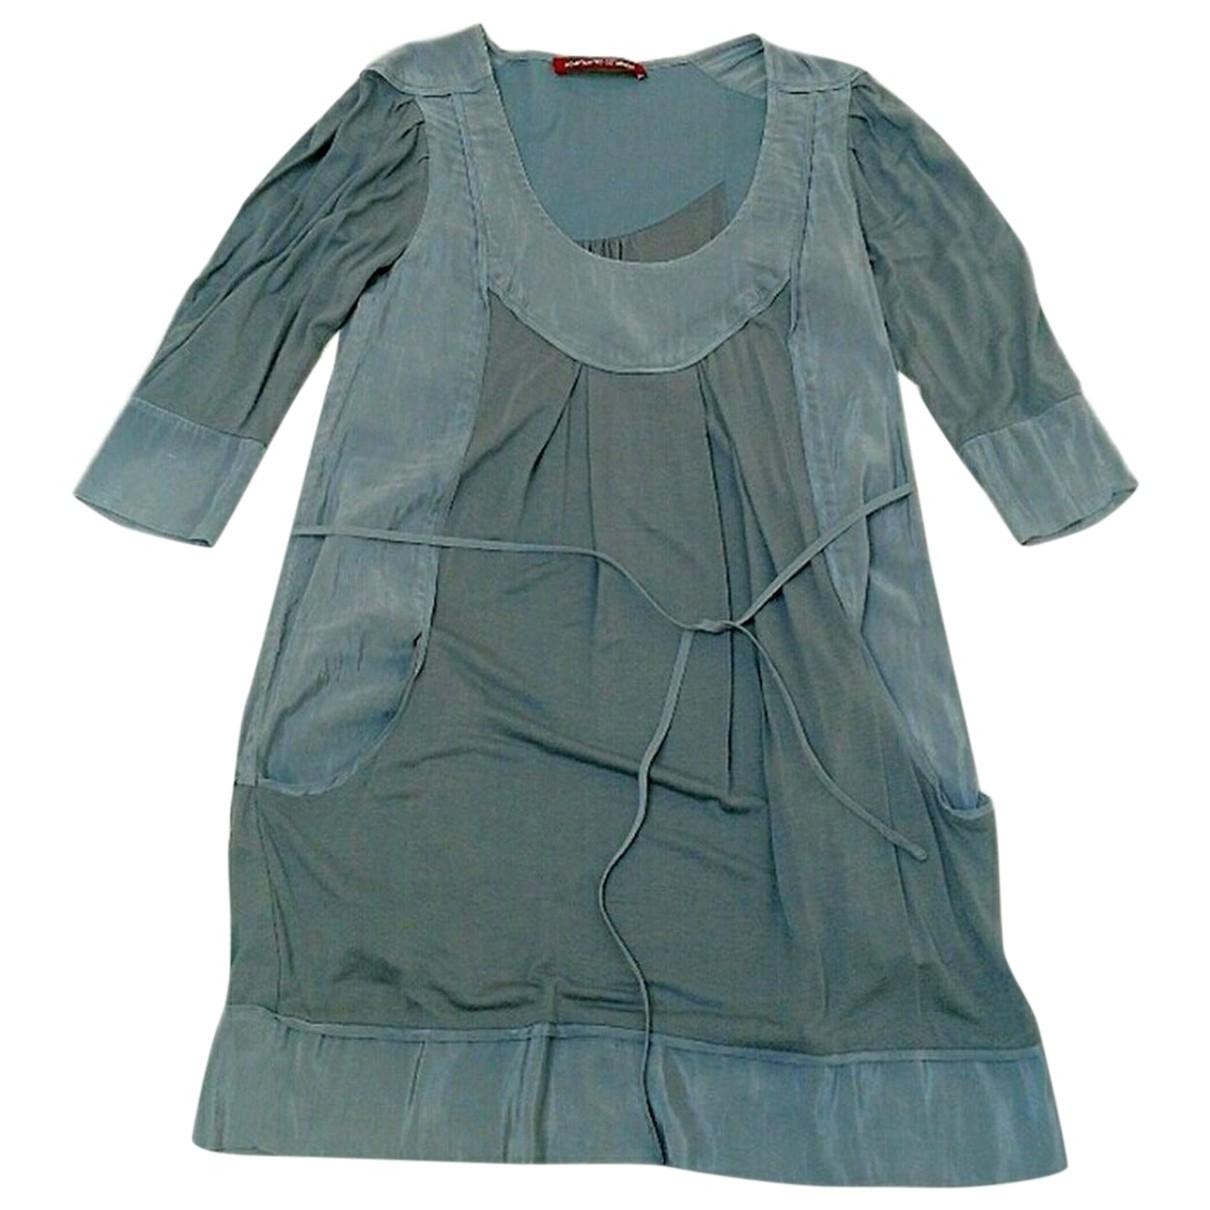 Comptoir Des Cotonniers \N Navy dress for Women XS International